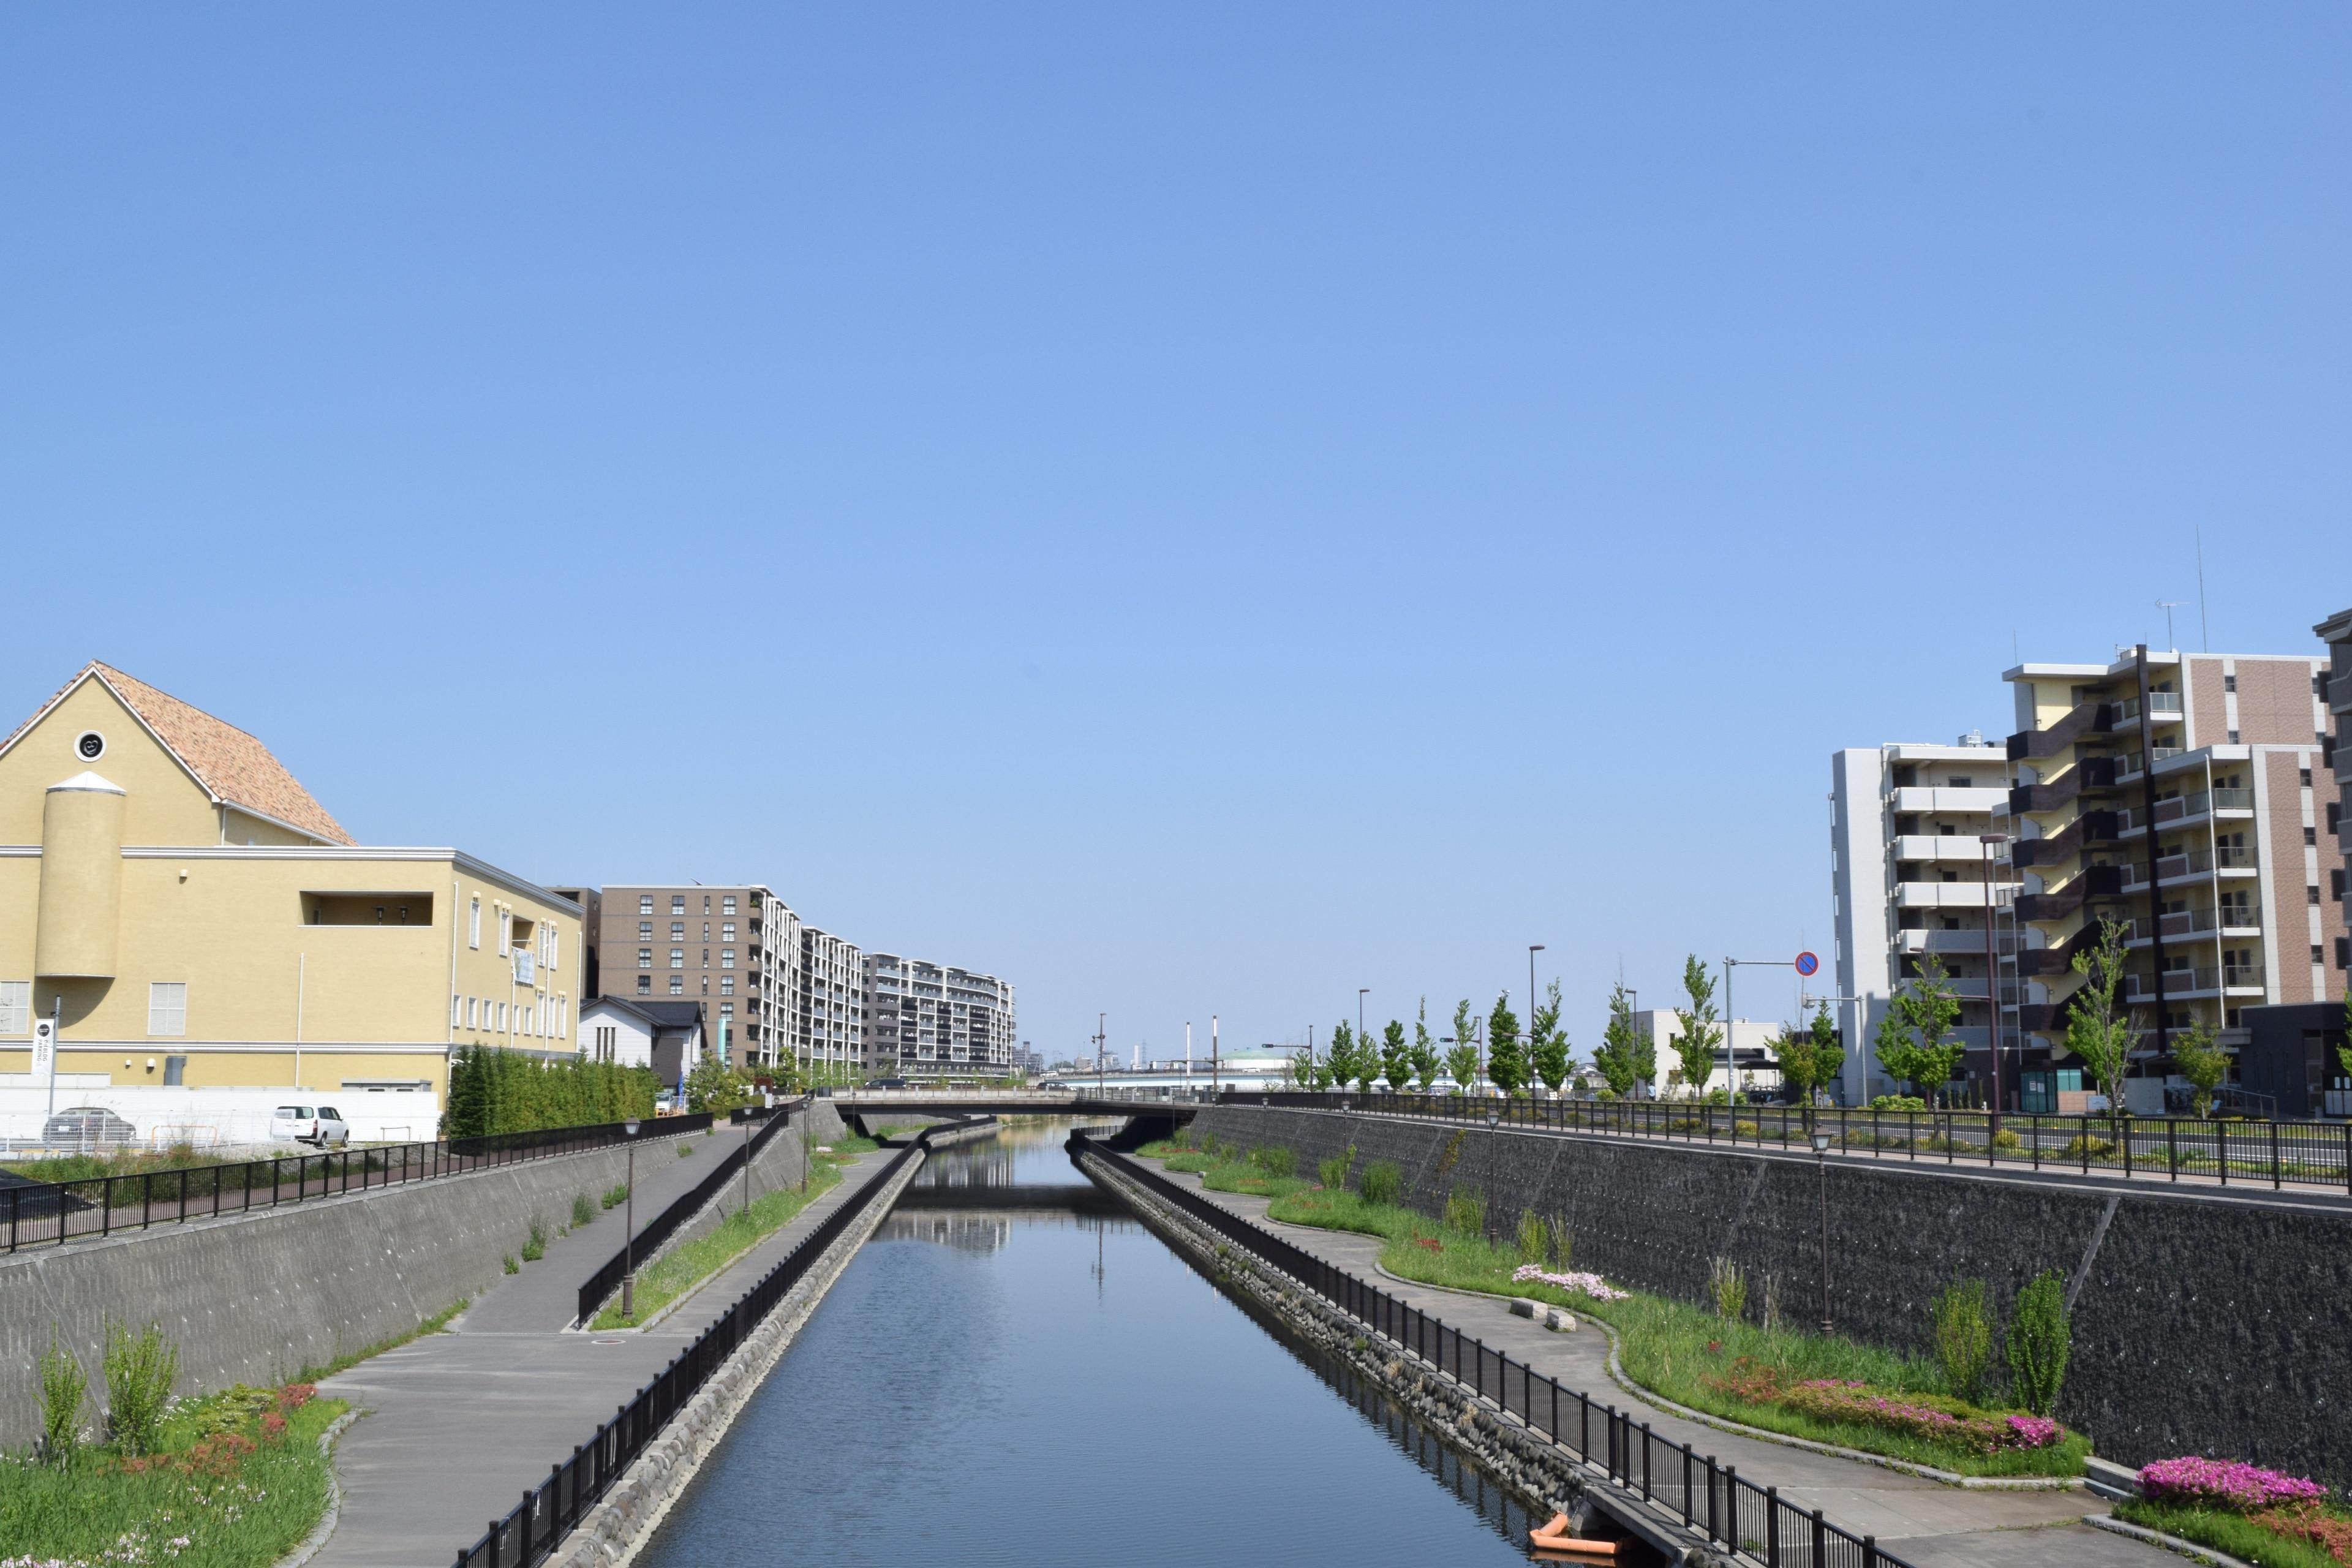 Koshigaya, Saitama Prefecture, Japan